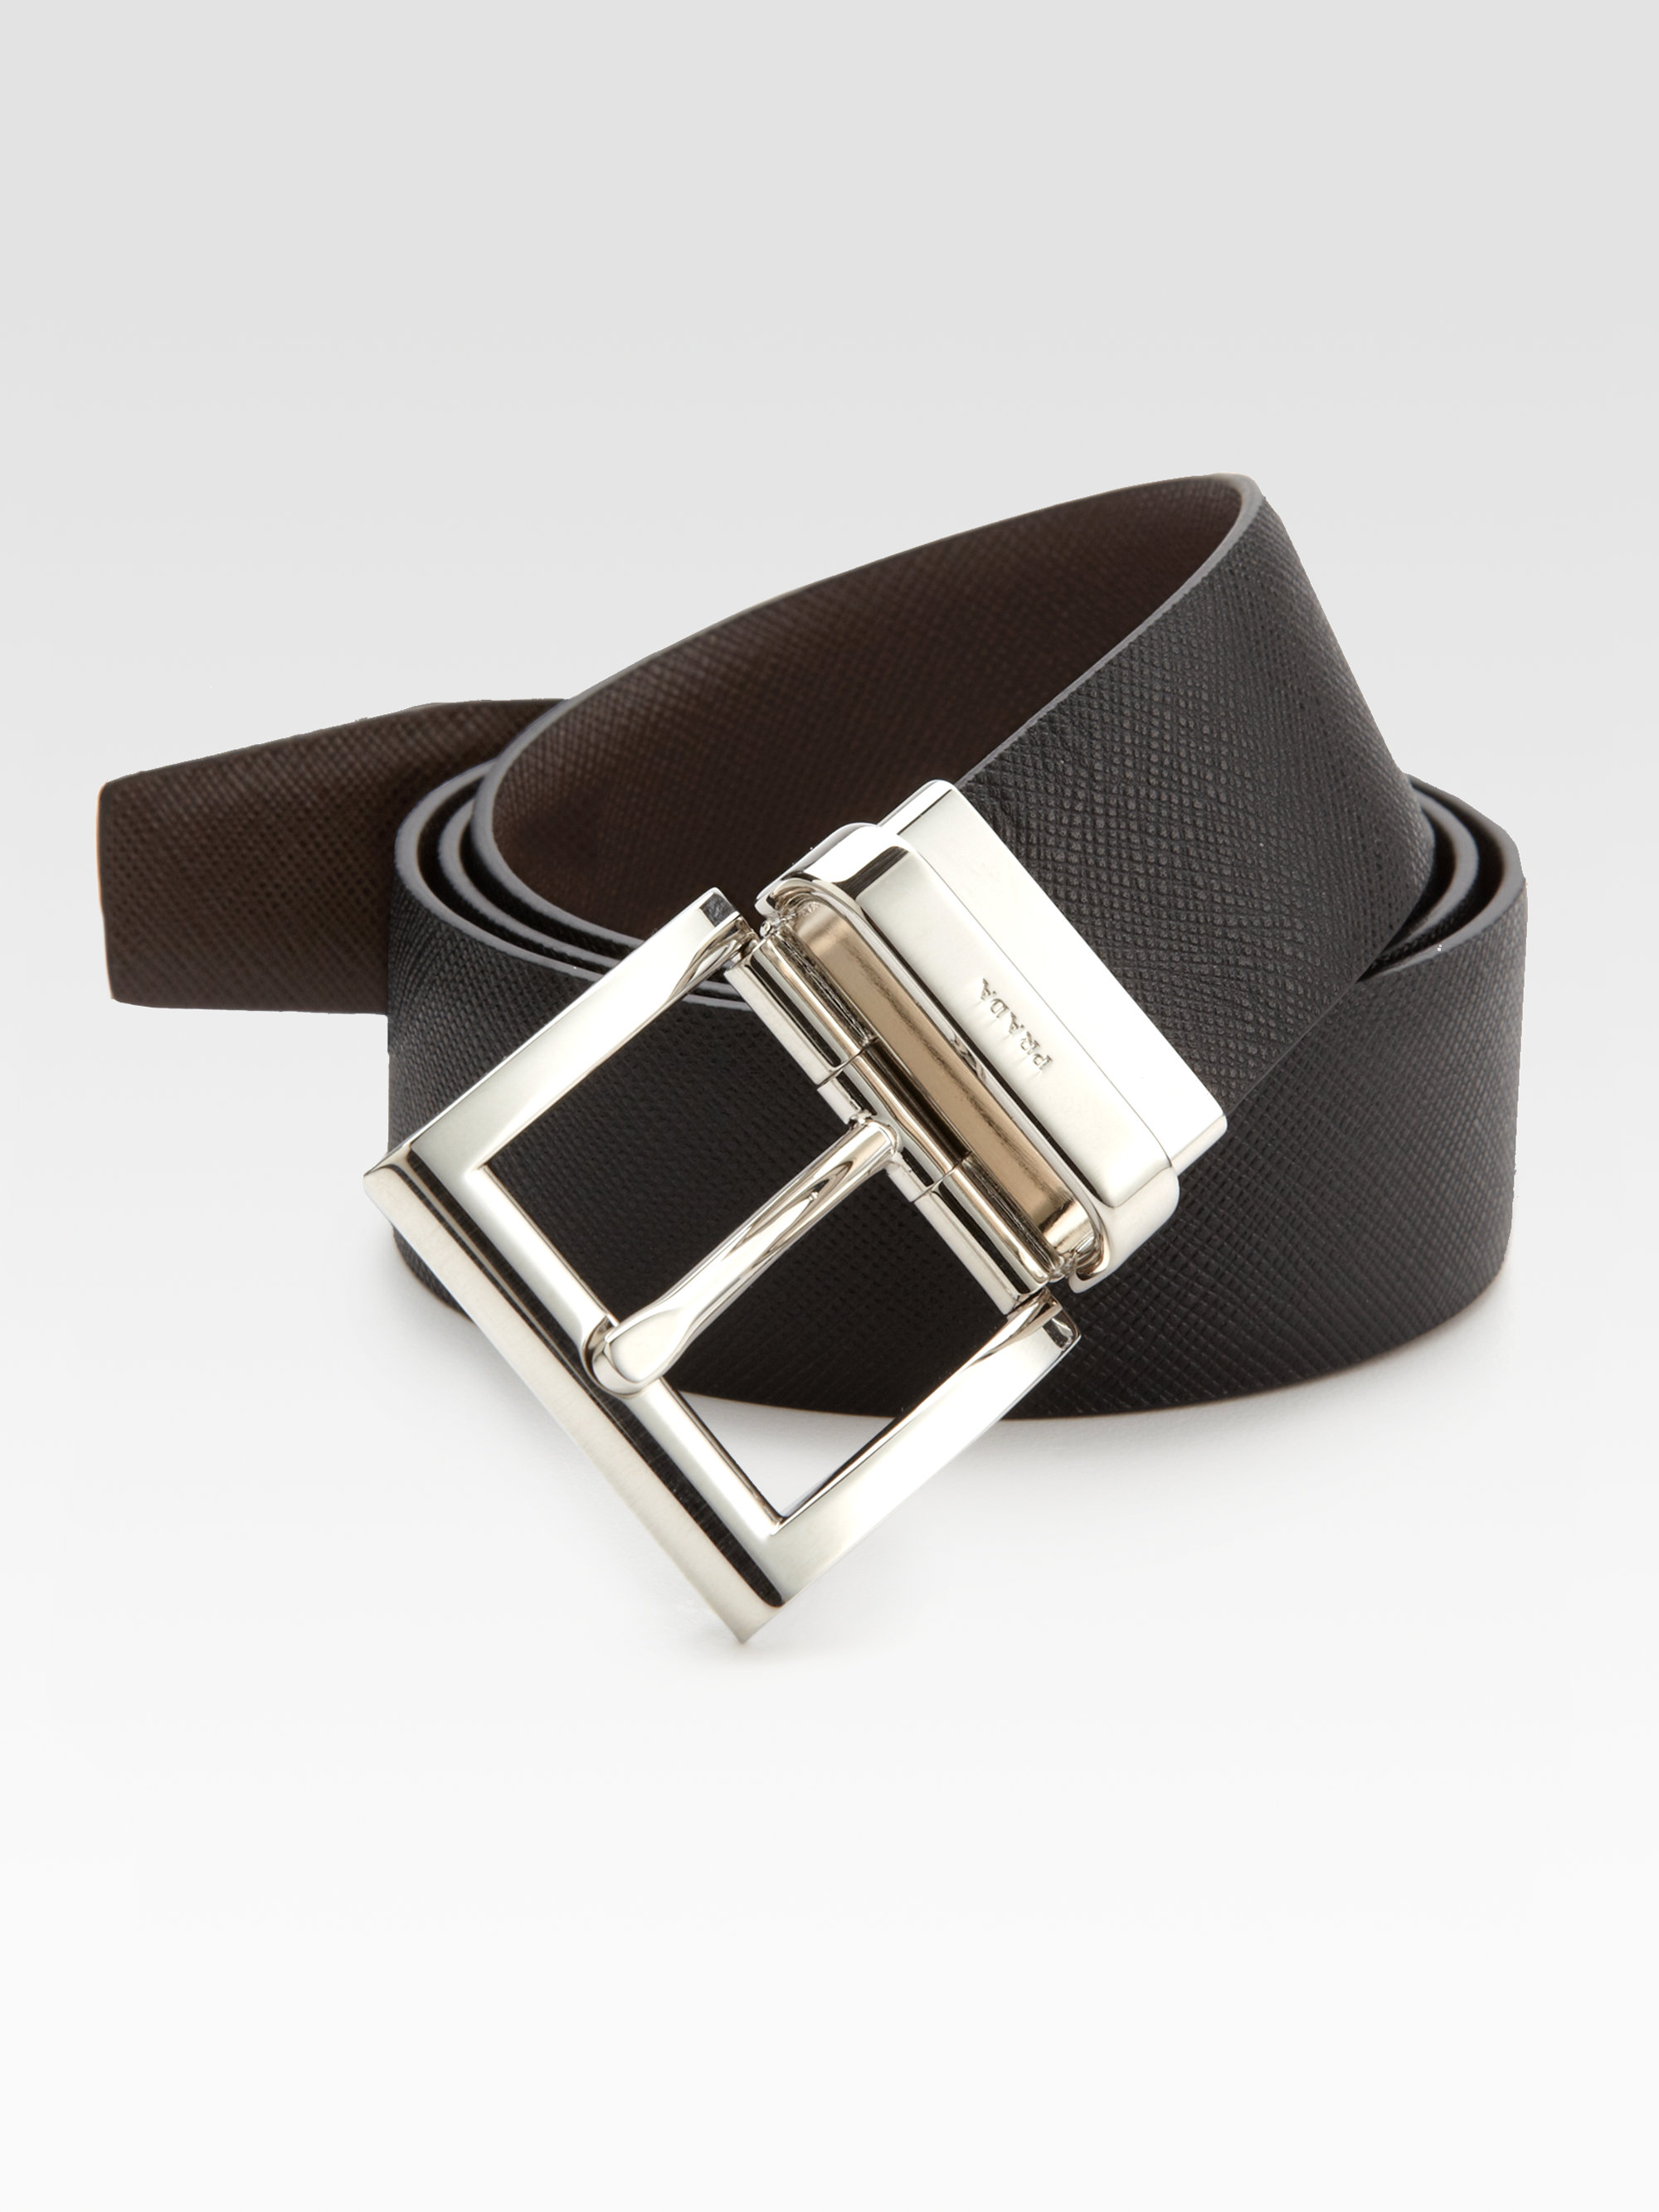 ... uk lyst prada saffiano reversible belt in black for men 1b4e6 7aa9f 1a0f090c20eff